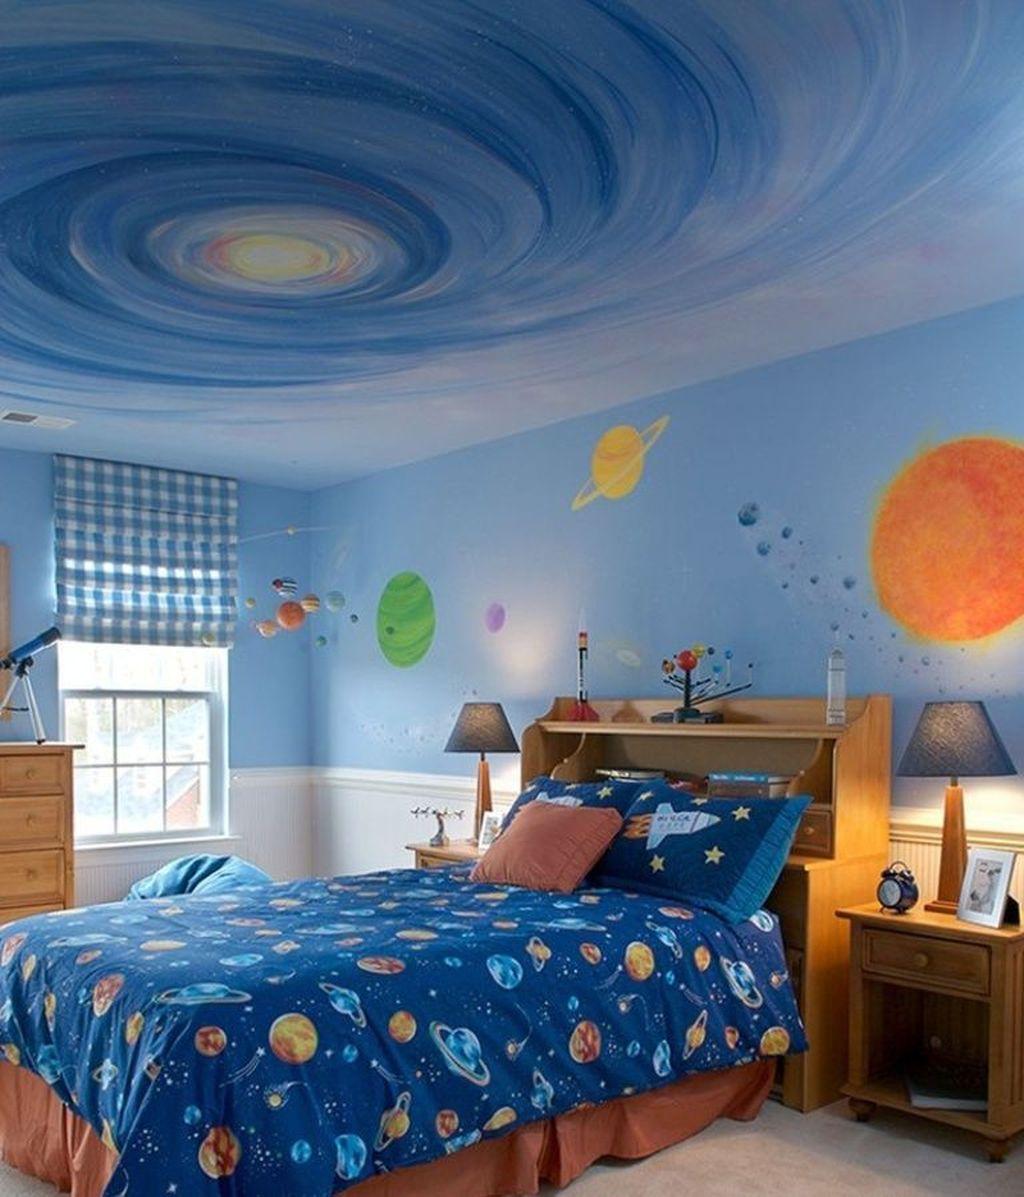 Inspiring Outer Space Bedroom Decor Ideas 22